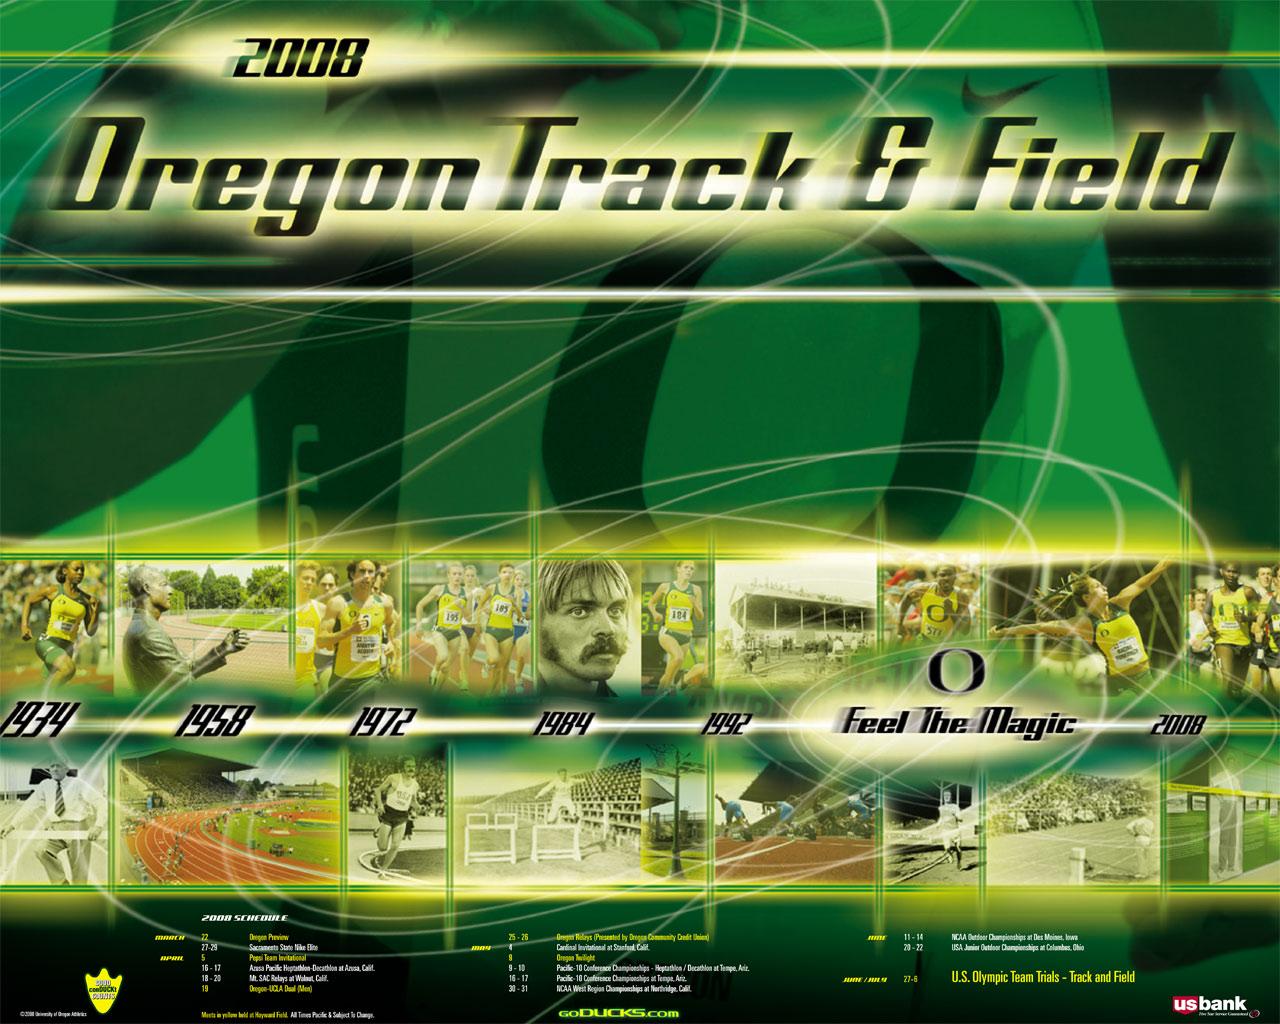 [74+] Track And Field Wallpaper on WallpaperSafari